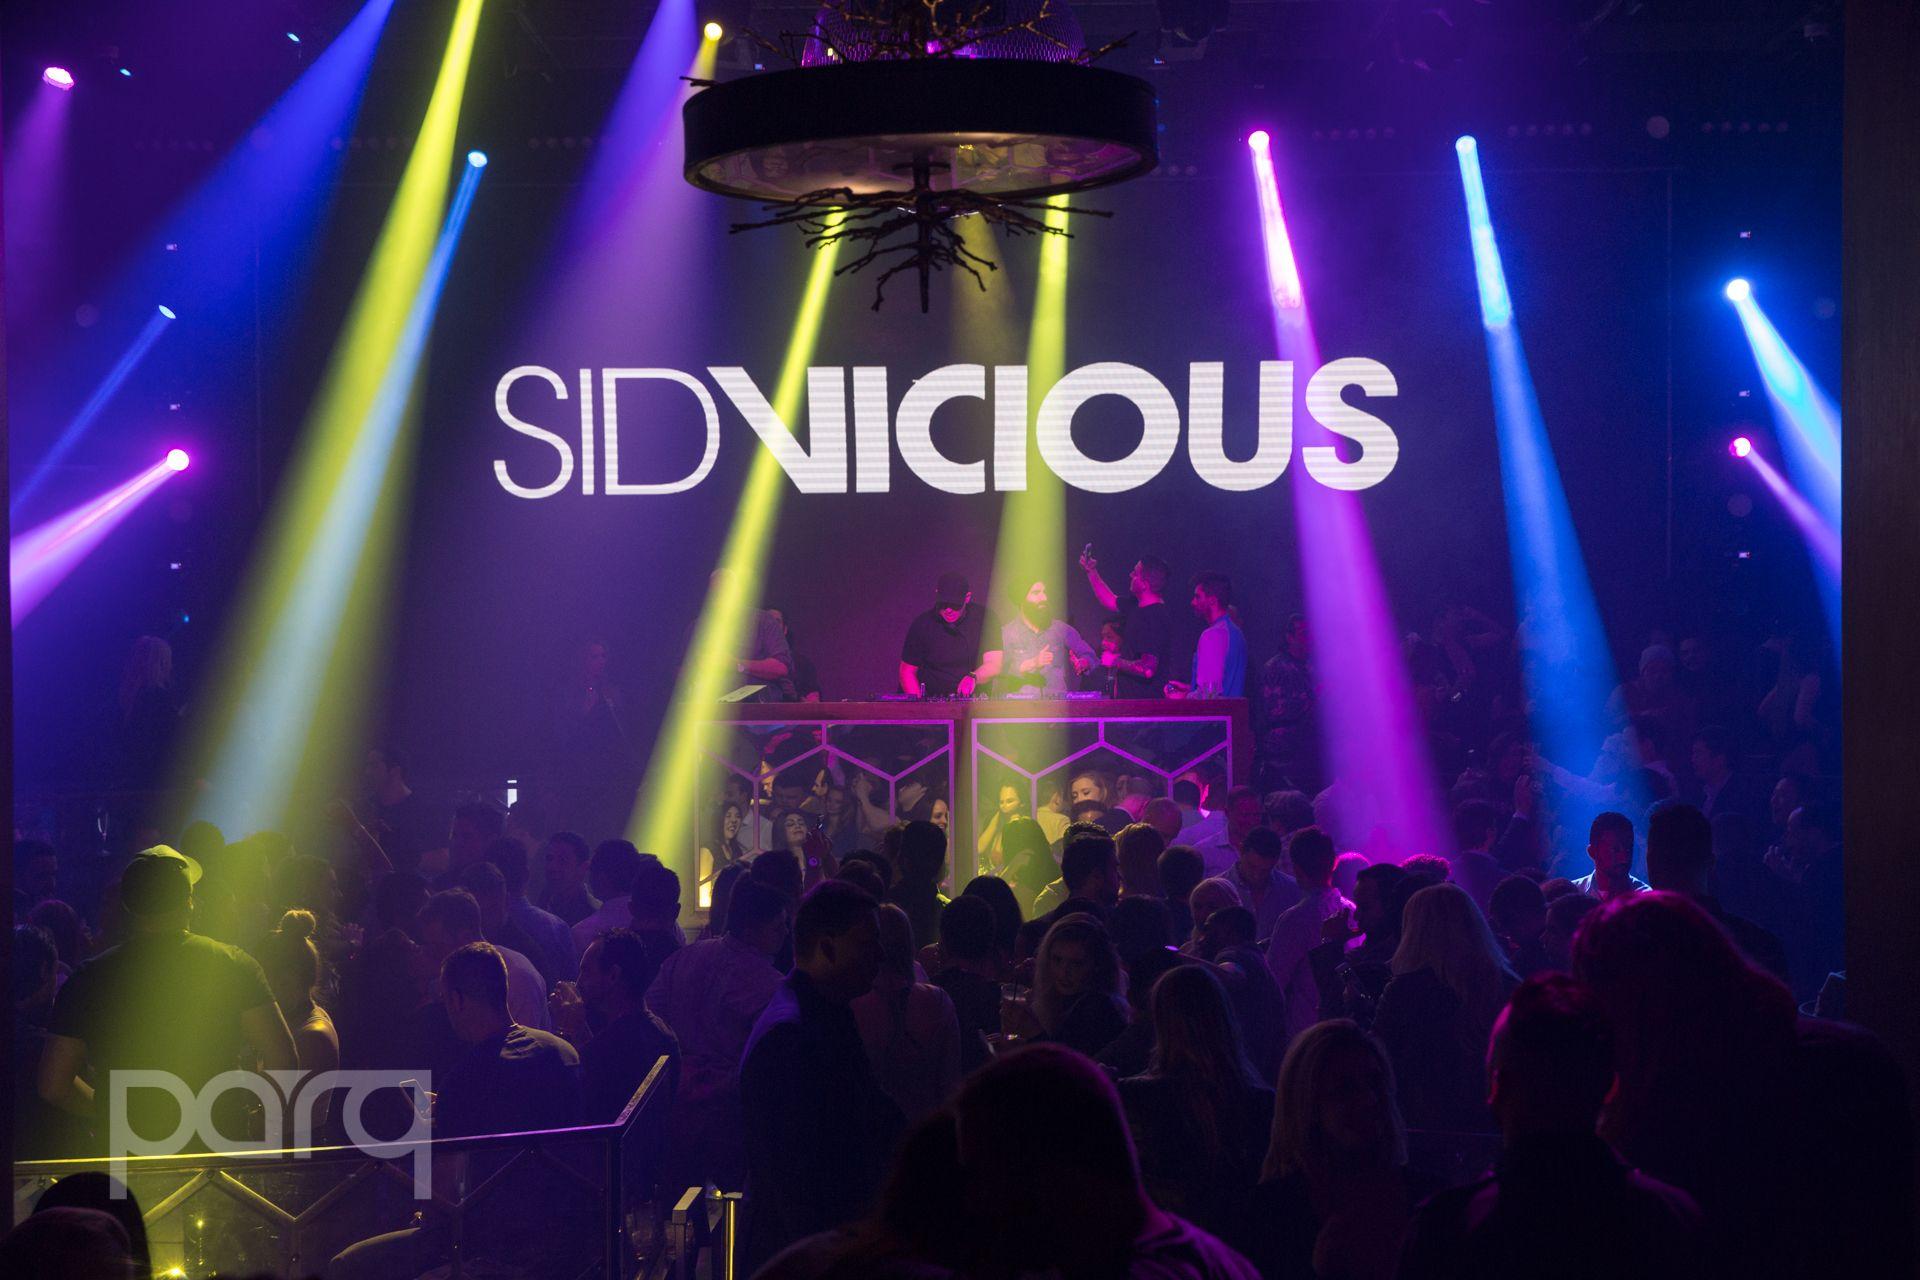 San-Diego-Nightclub-Sid Vicious-1.jpg